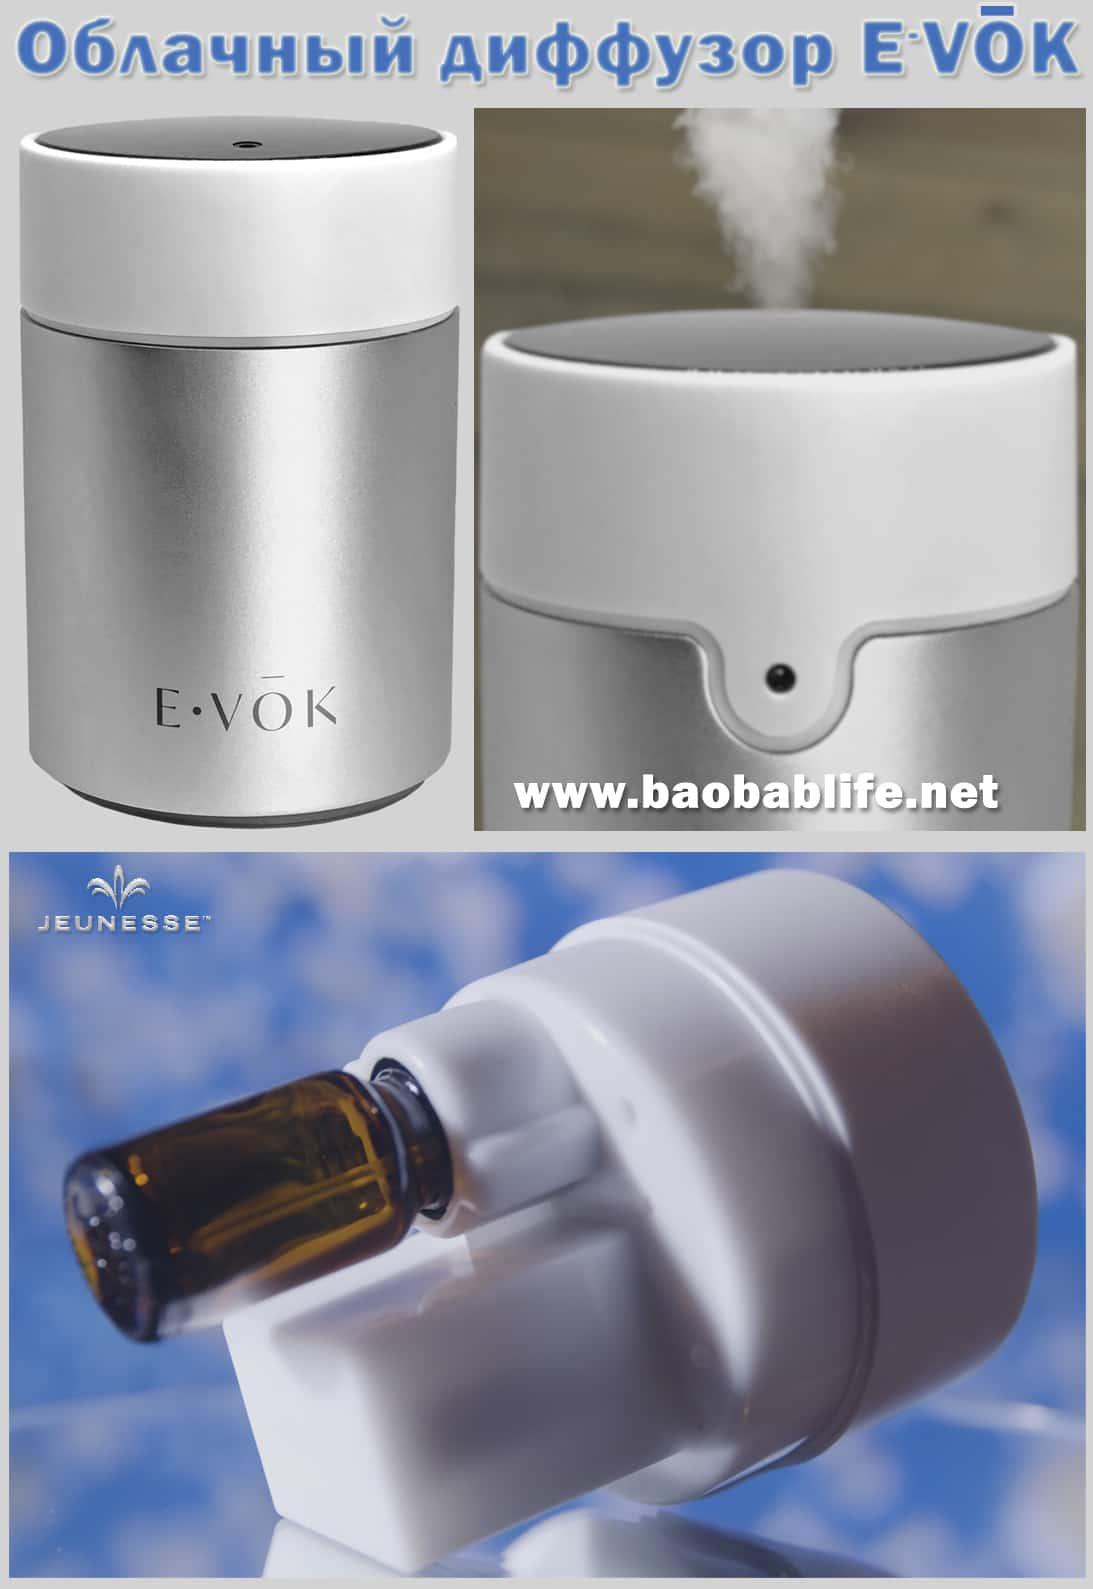 Диффузор EVOK от Женесс